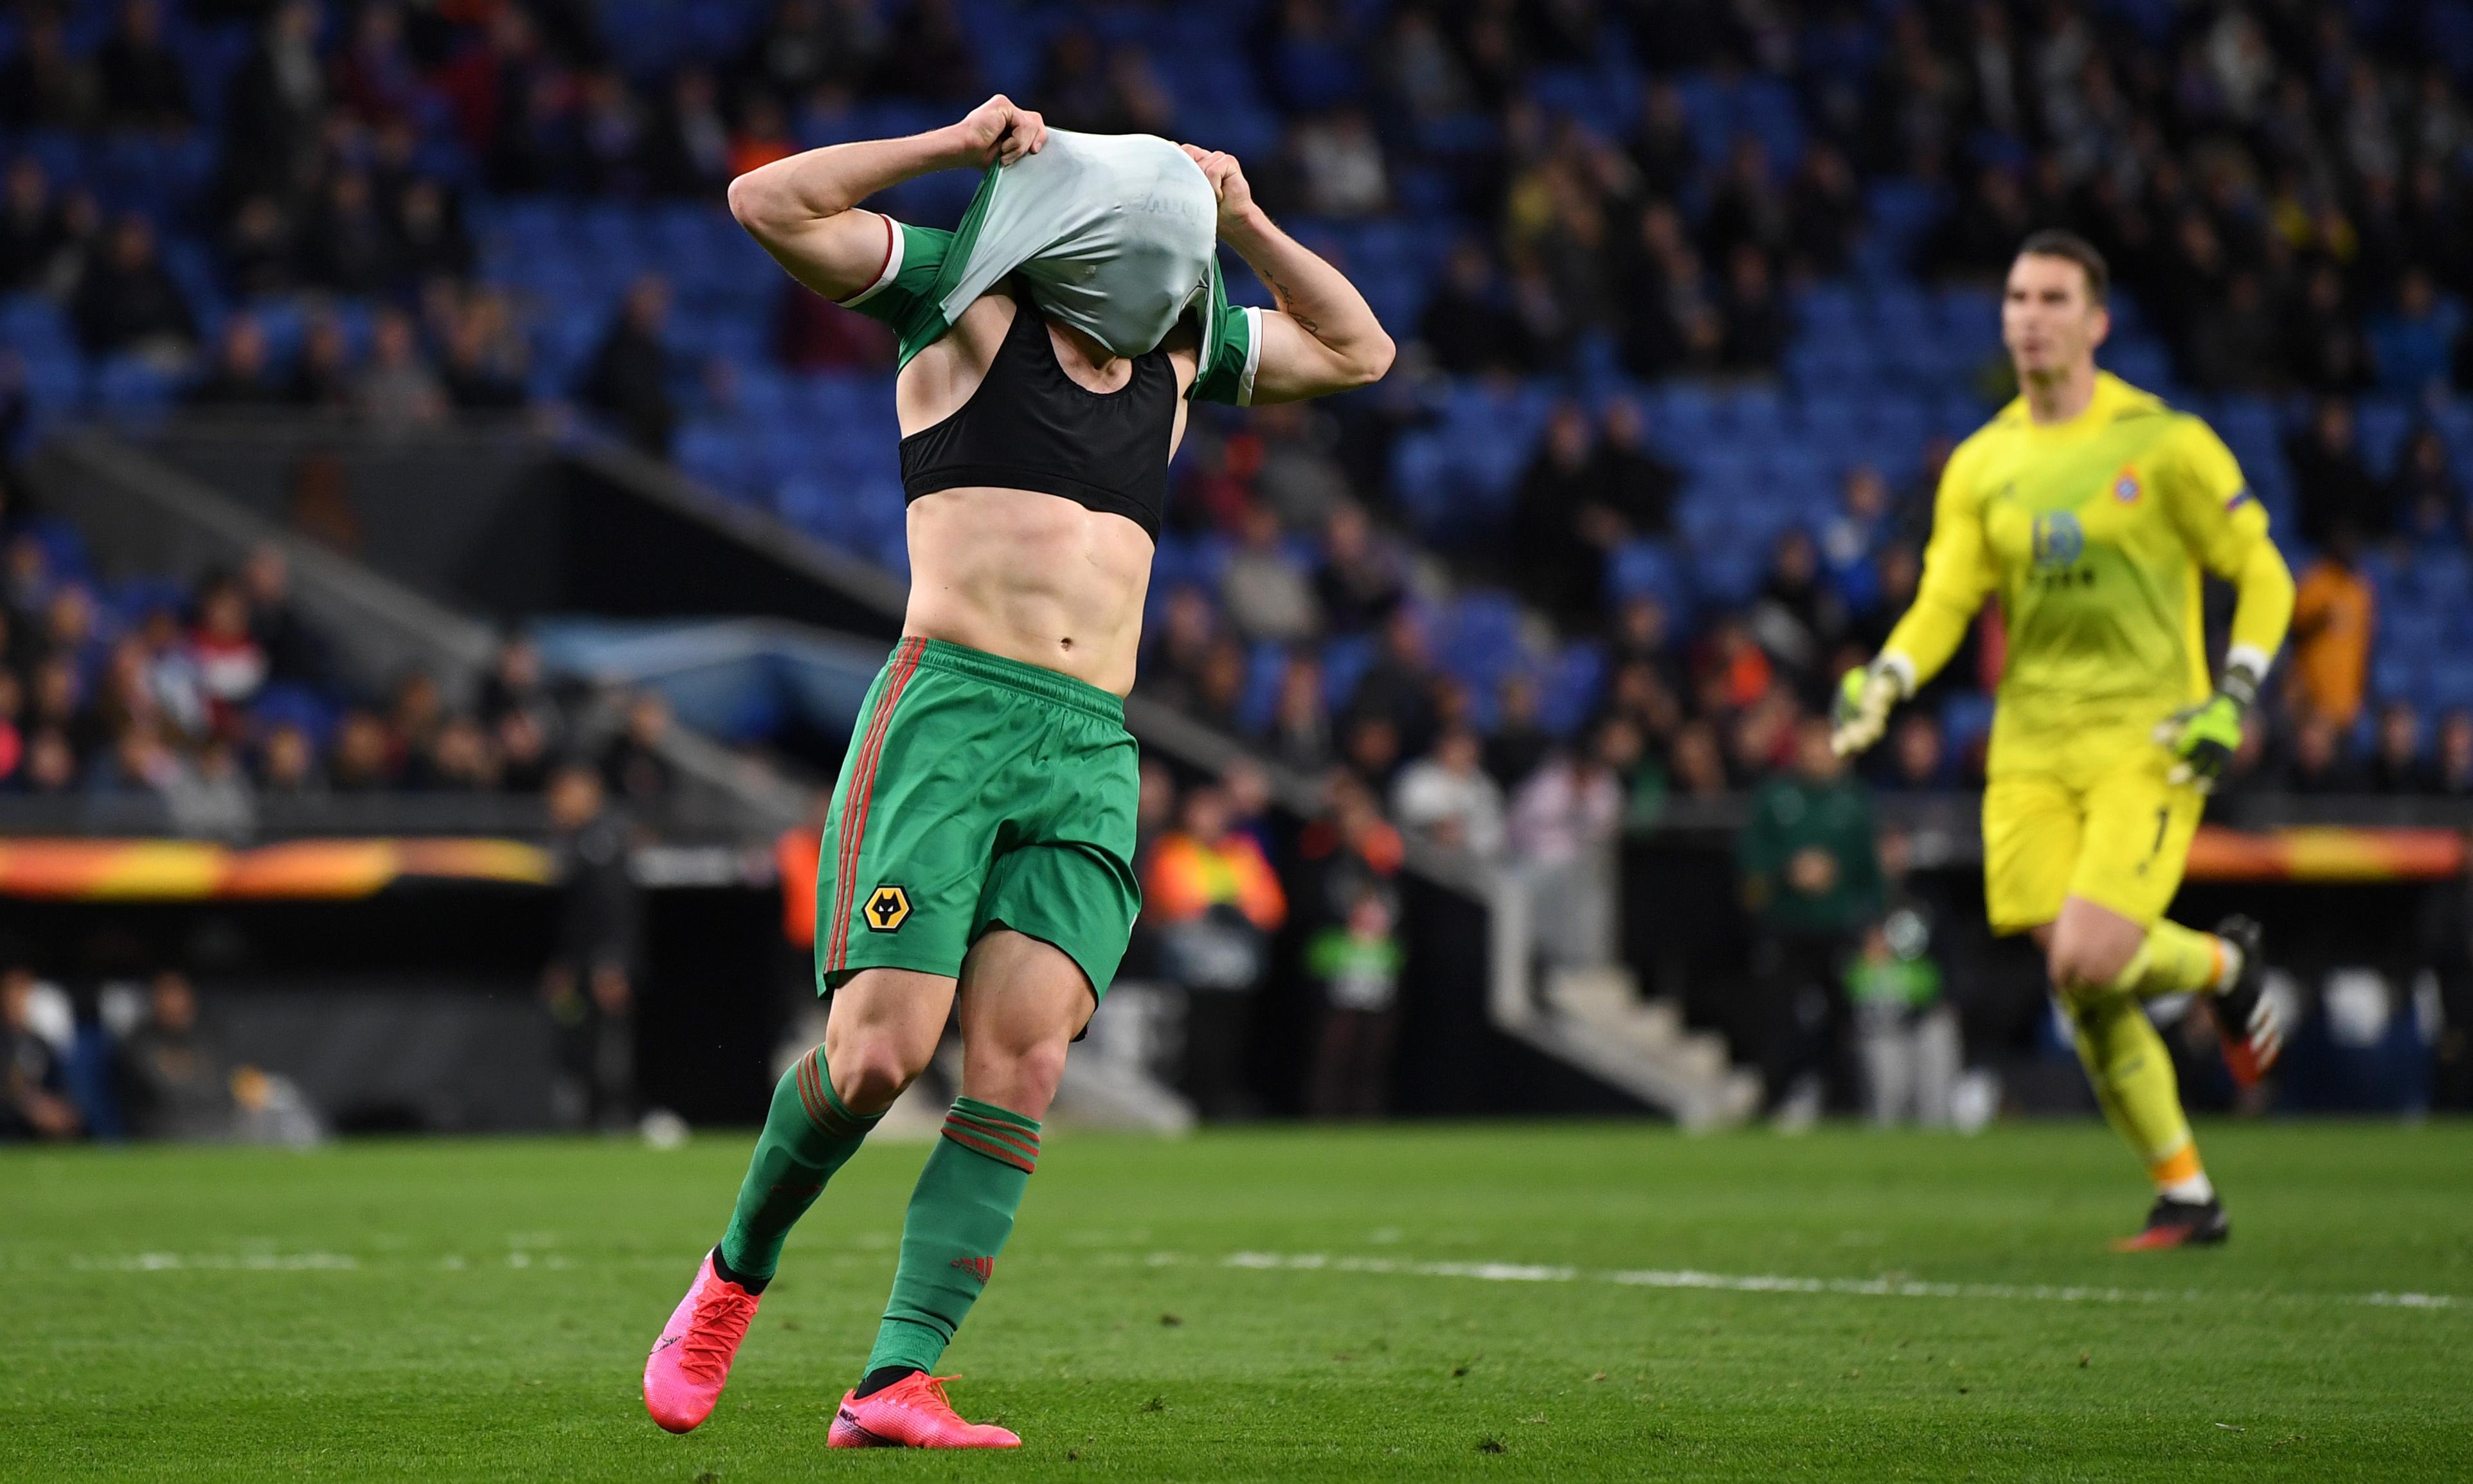 Wolves progress in Europa League despite Espanyol loss and Neto howler